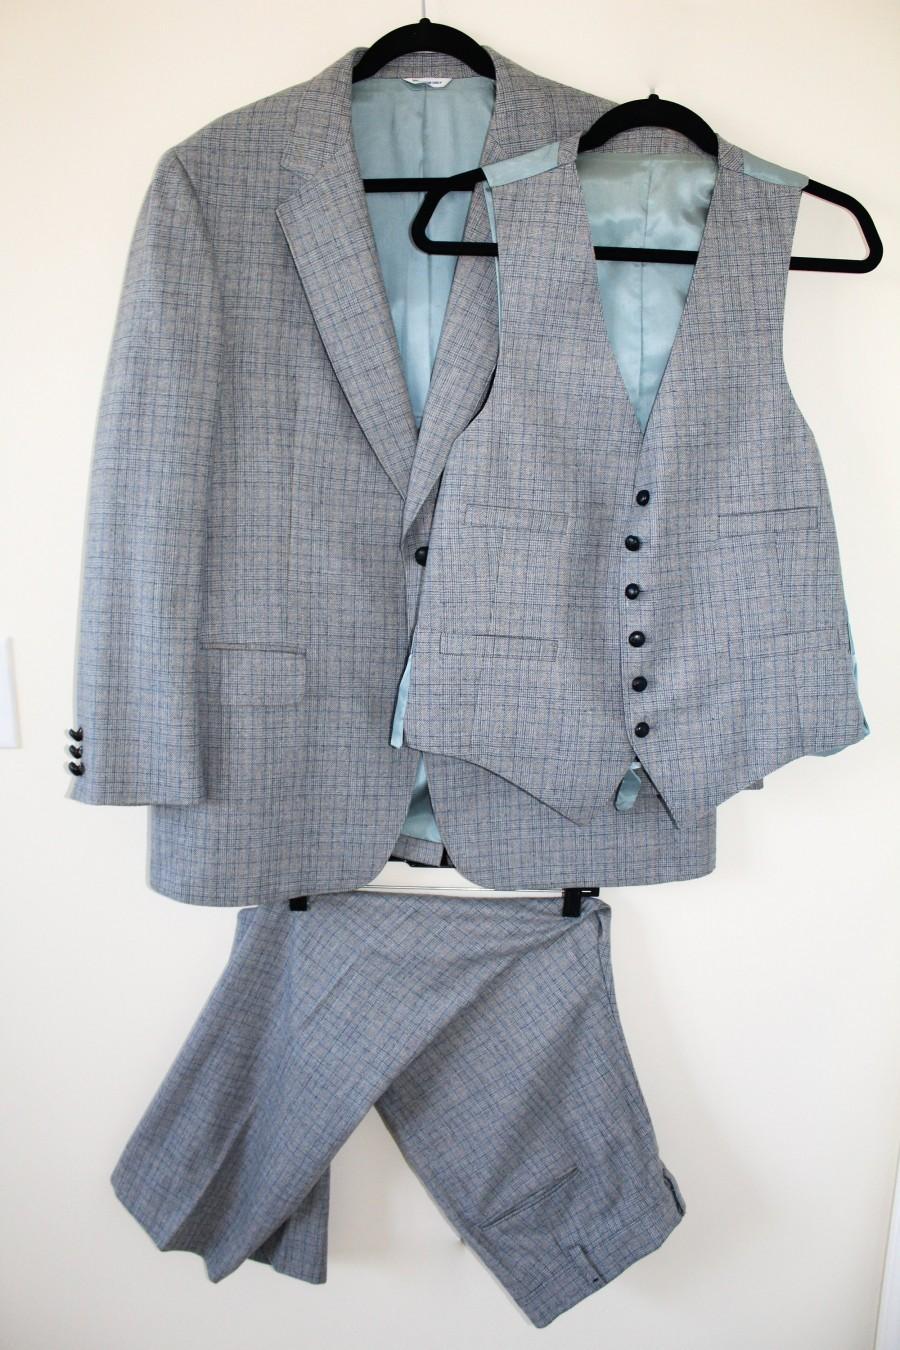 Wedding - Rare Custom 1960s 3 pc Tweed Suit Mad Men Vintage Wedding